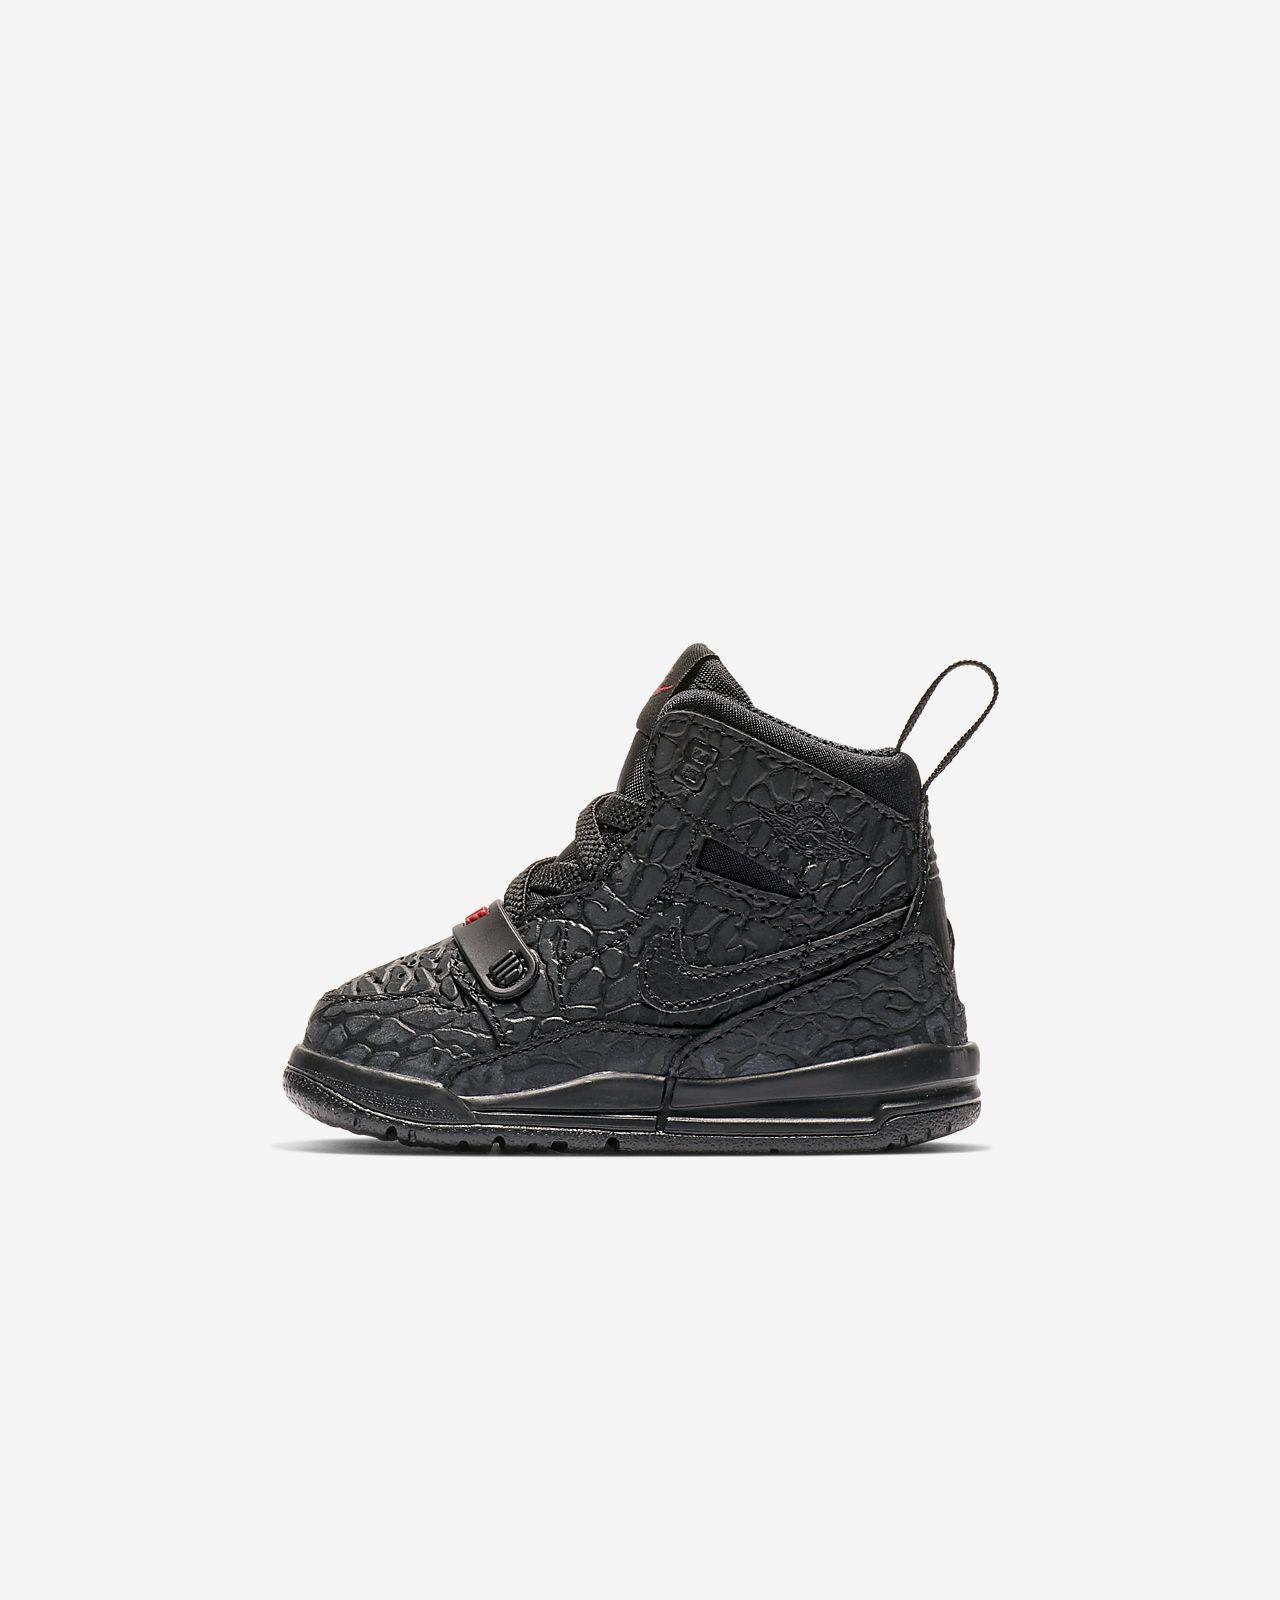 Air Jordan Legacy 312 sko til sped-/småbarn